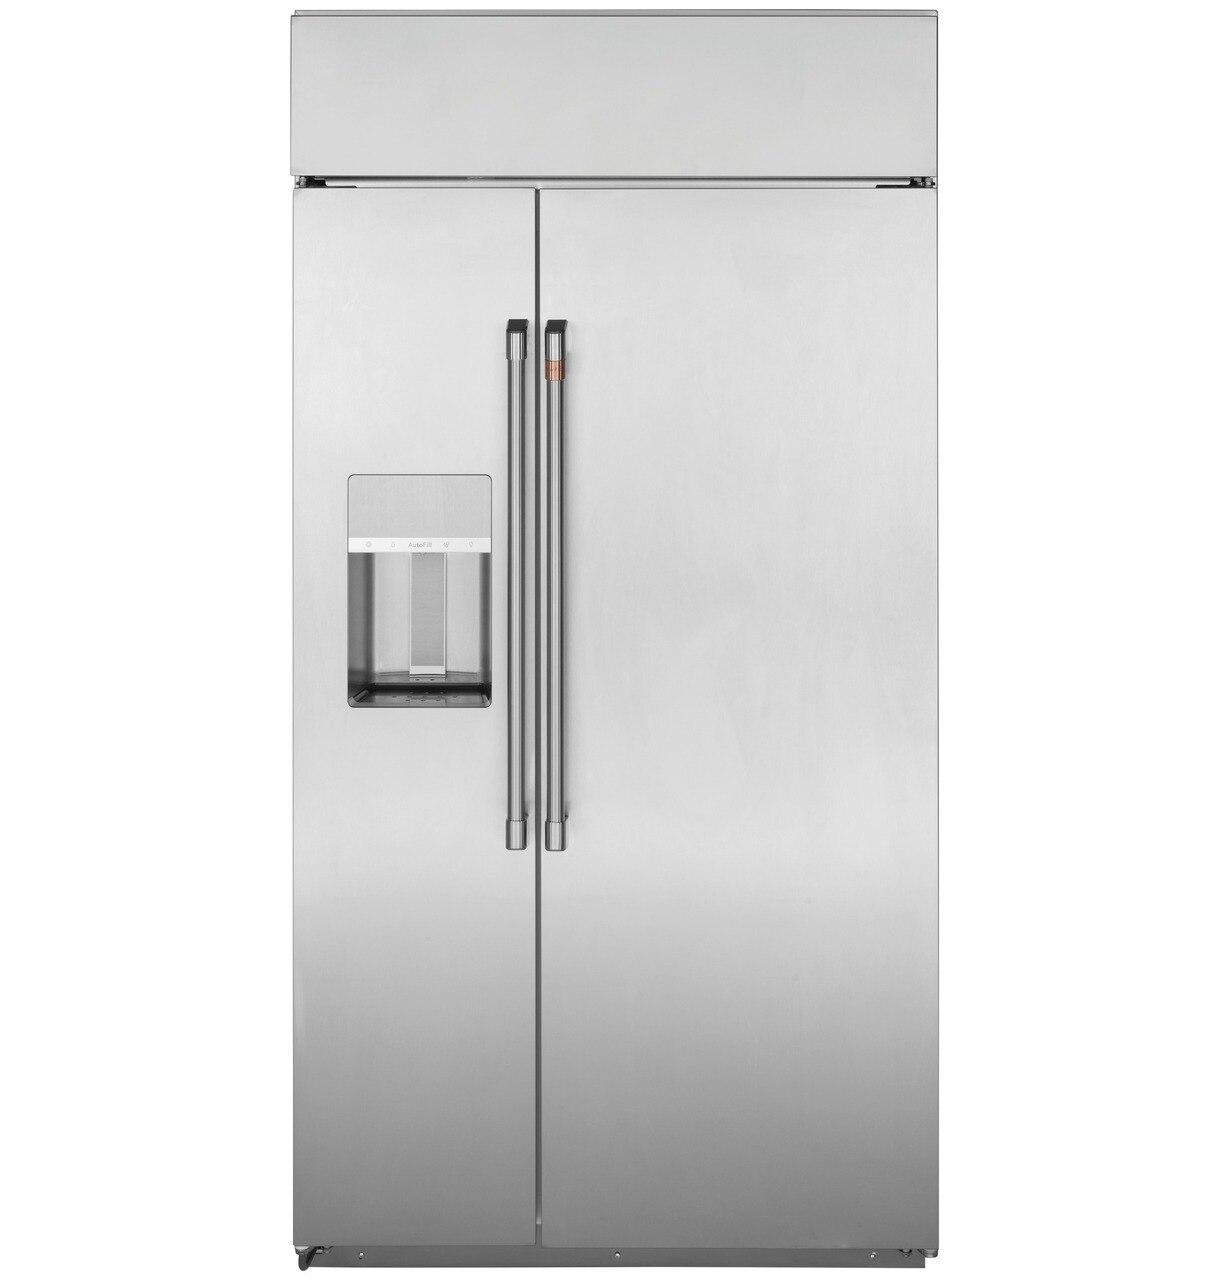 "Cafe Appliances48"" Smart Built-In Side-By-Side Refrigerator With Dispenser"